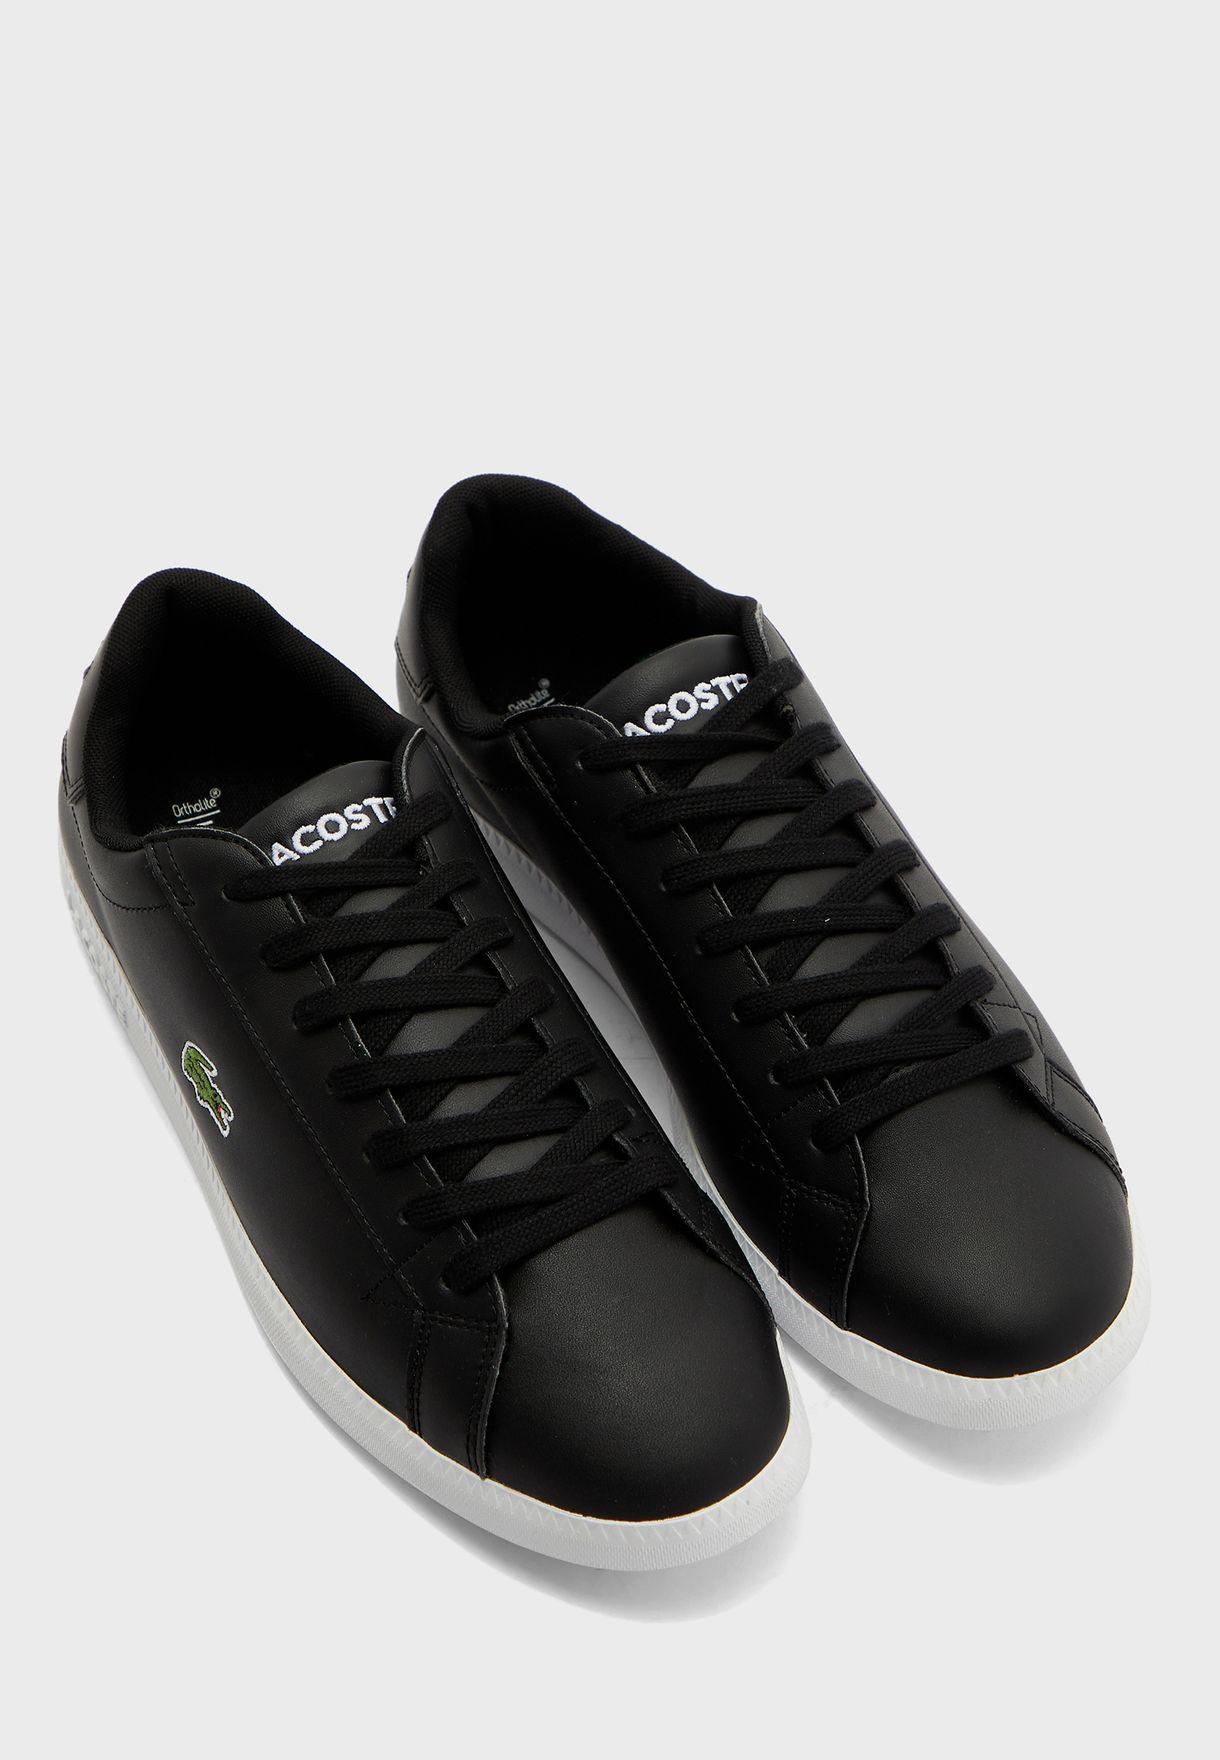 Graduate Sneakers